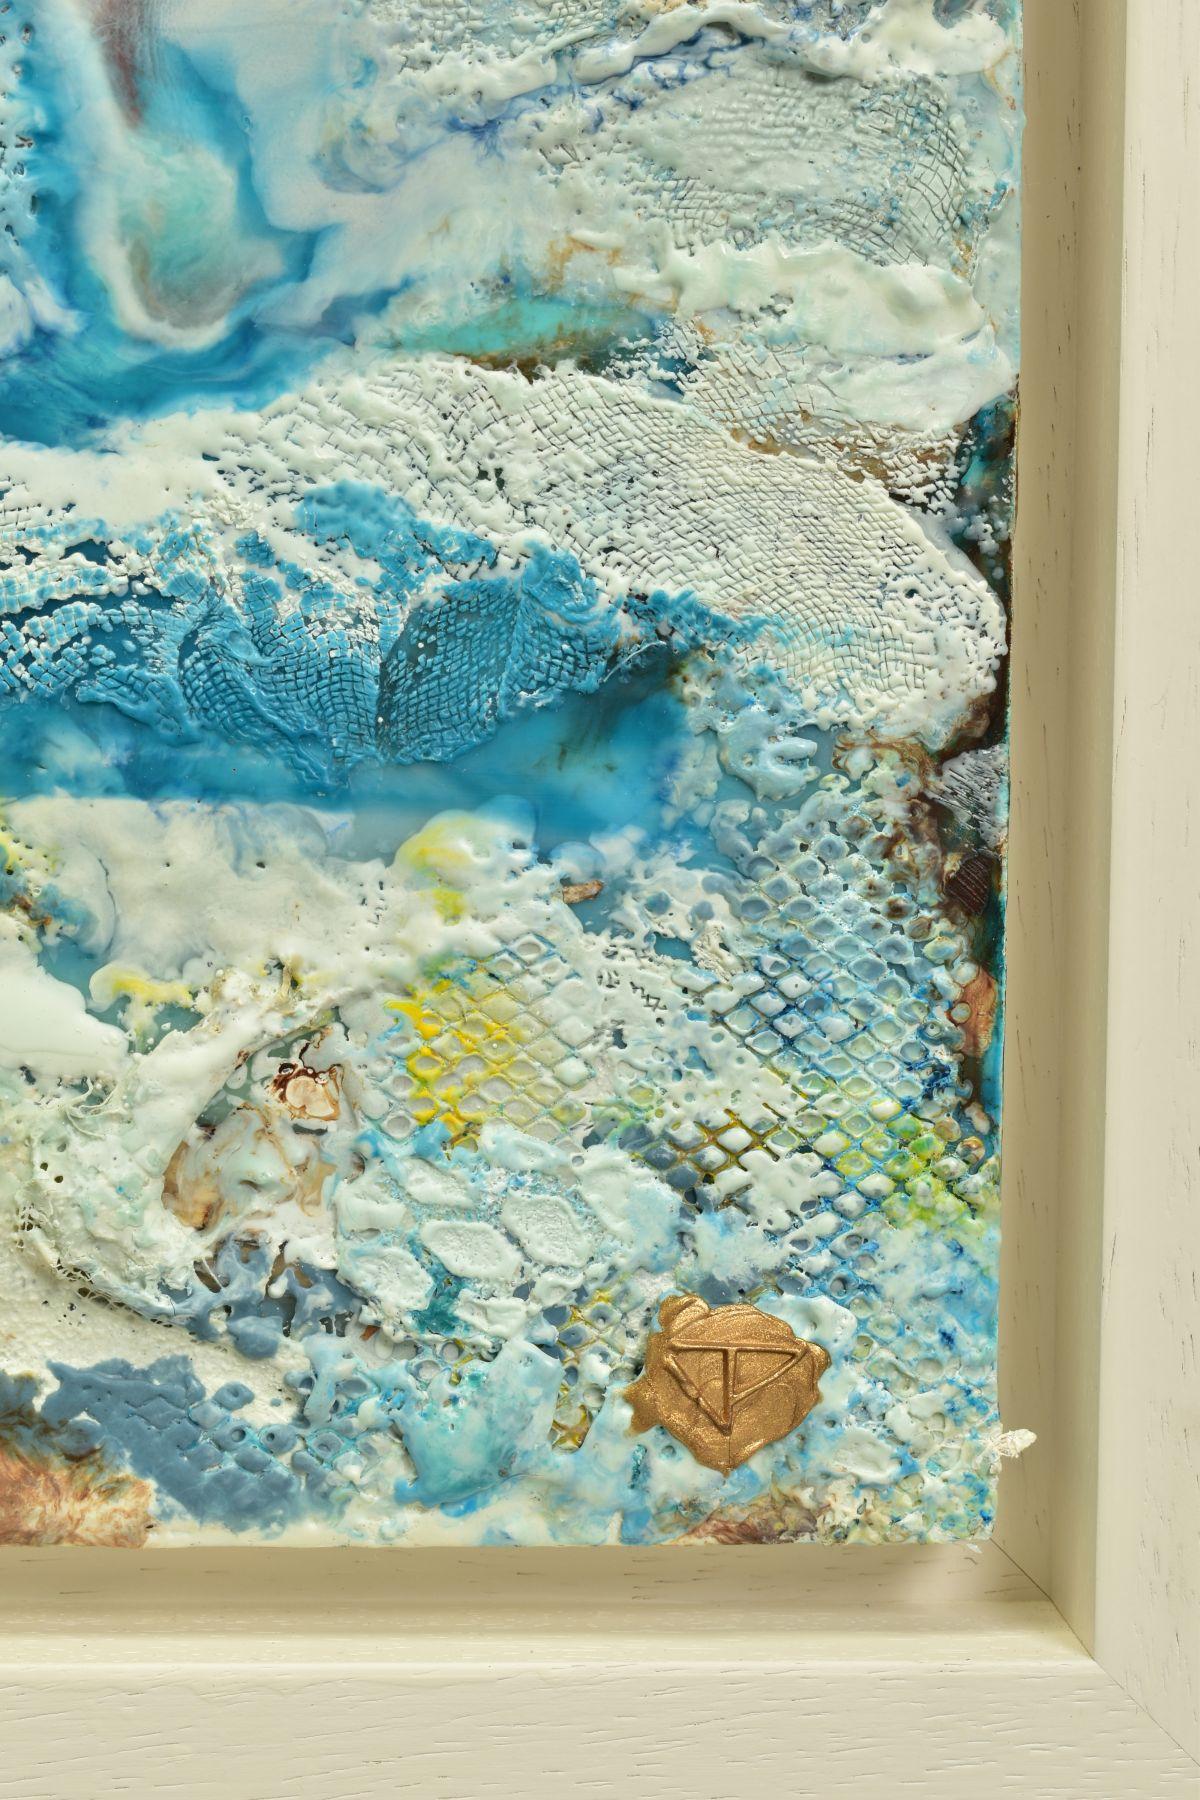 JENNINE PARKER (BRITISH 1971), 'Sea of Splendor', a coastal seascape, initialled bottom right, mixed - Image 3 of 7